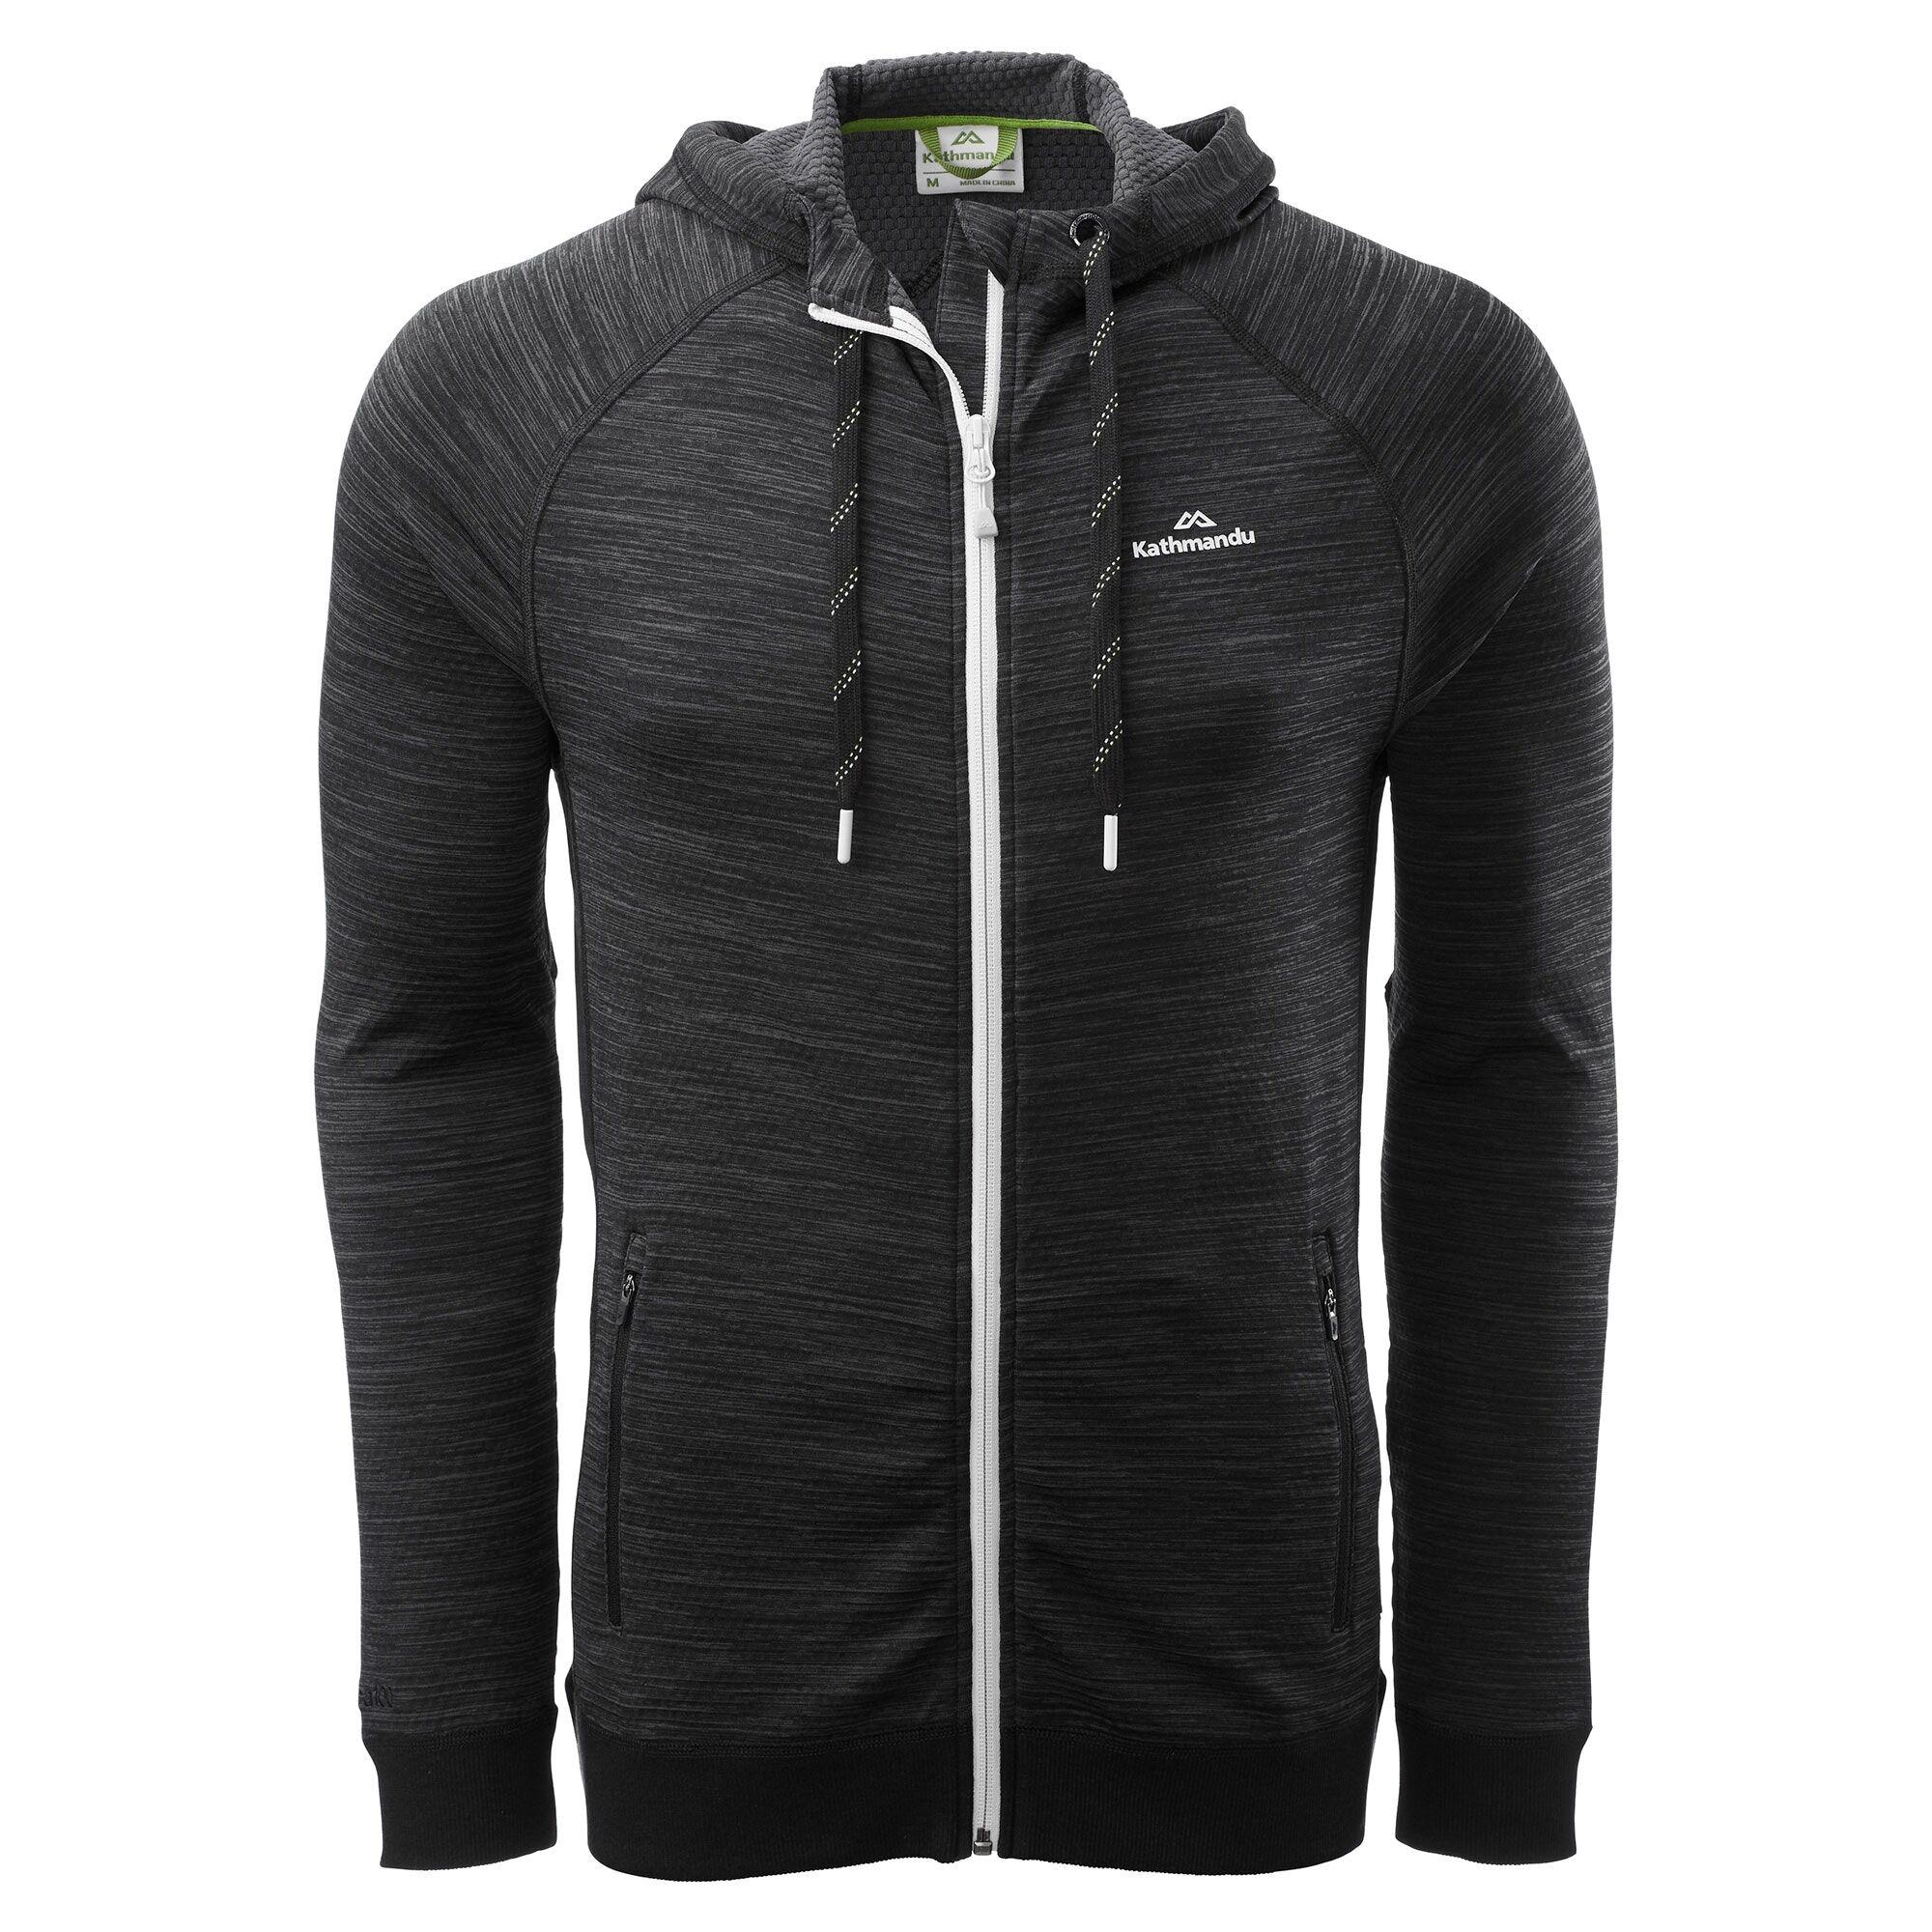 Kathmandu Acota Men's Hooded Fleece Jacket  - Granite Marle/Black - Size: Small